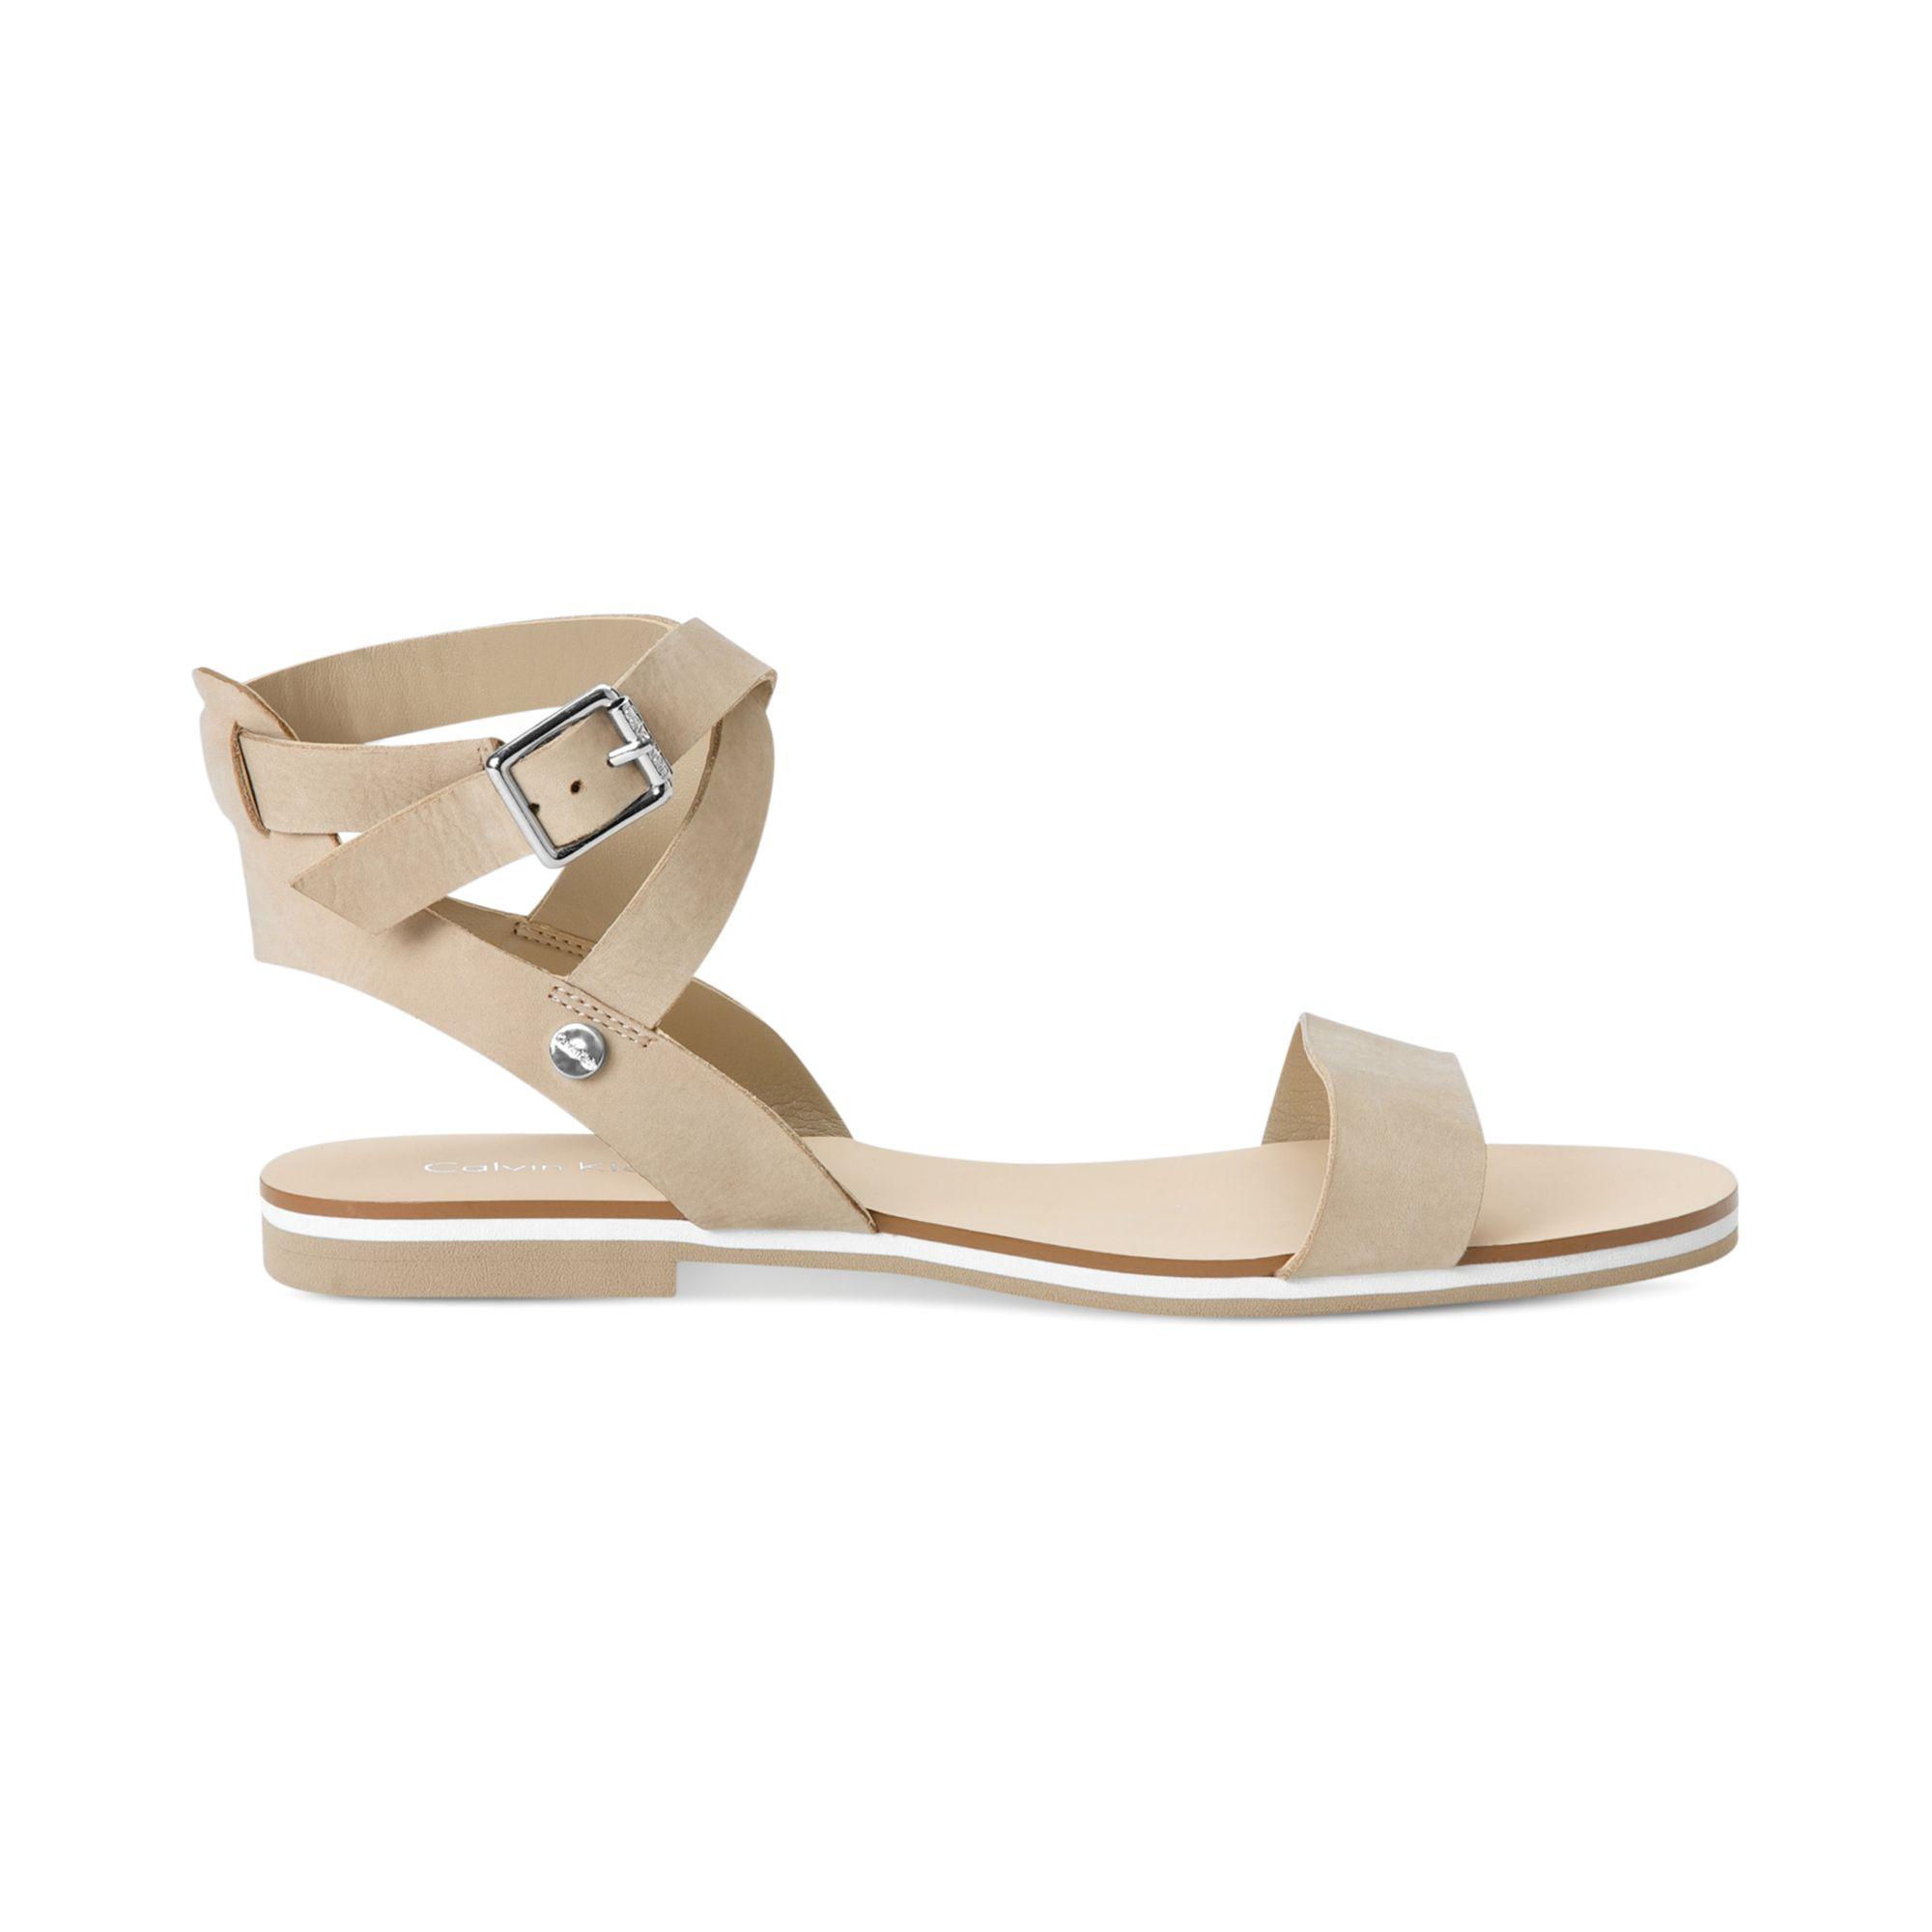 615b2257c Lyst - Calvin Klein Carolina Flat Sandals in Natural